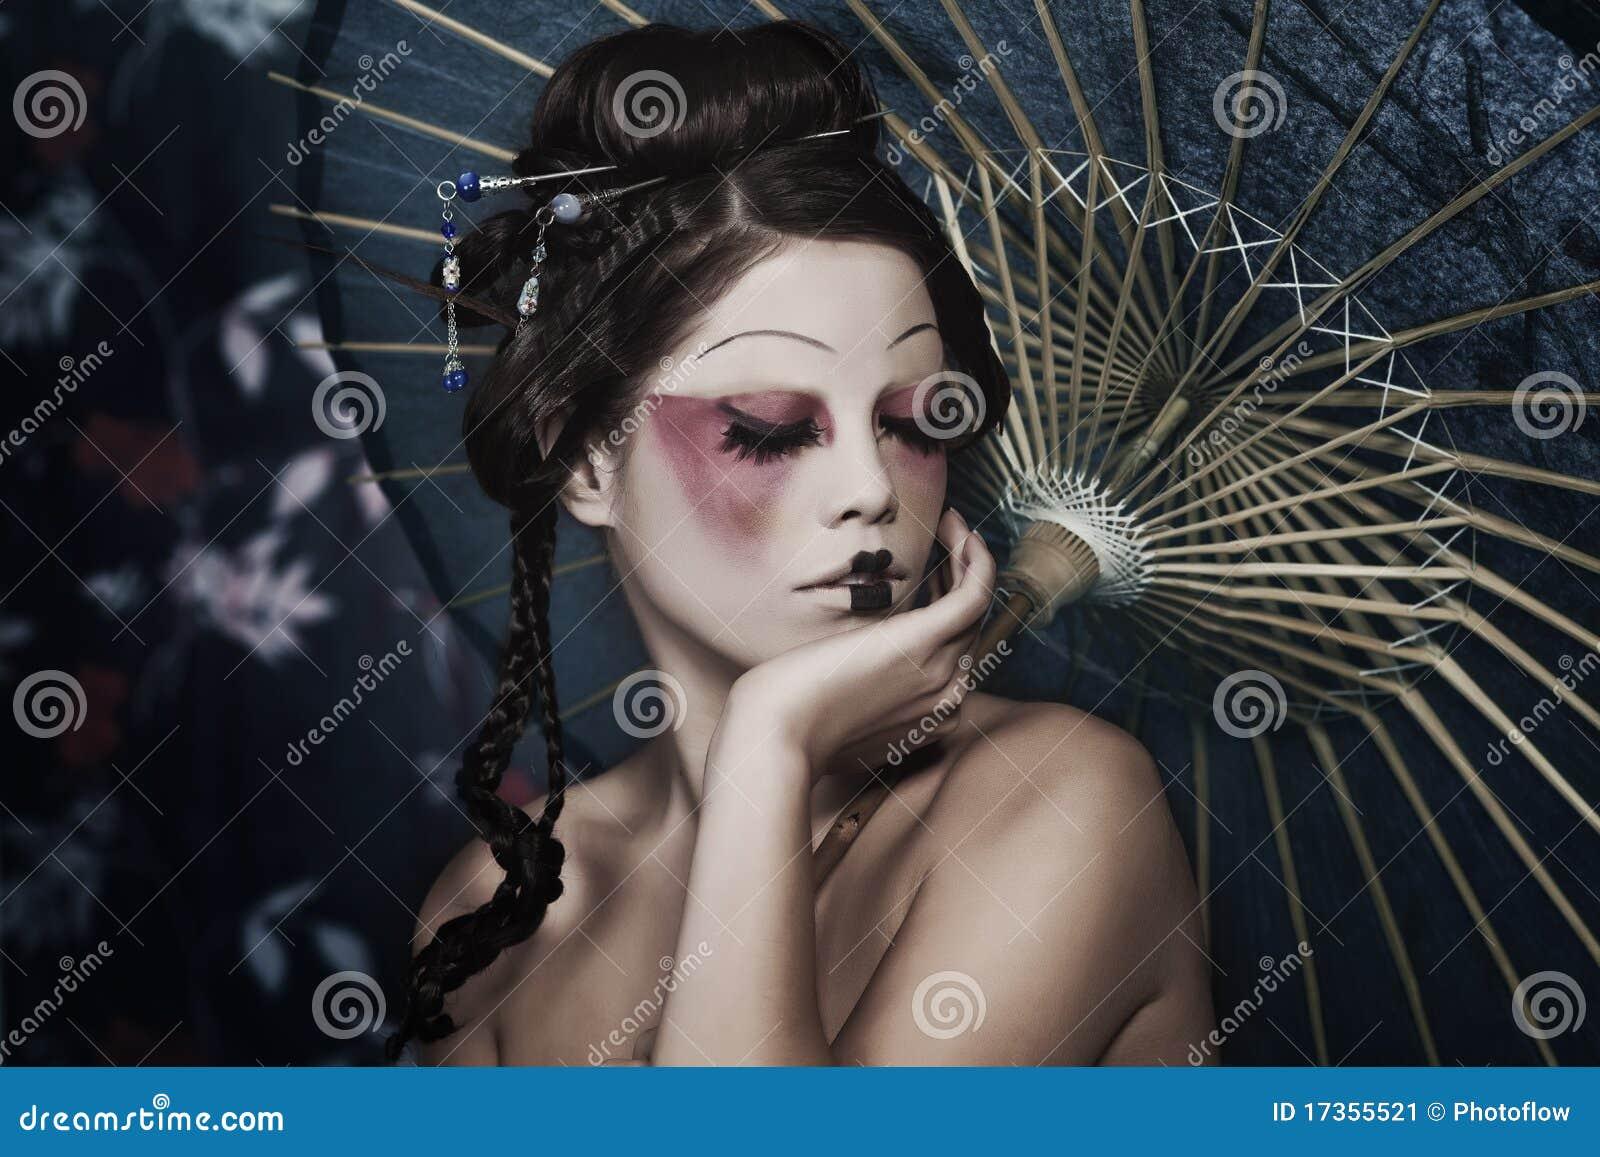 A beautiful geisha with a bbc mh 5